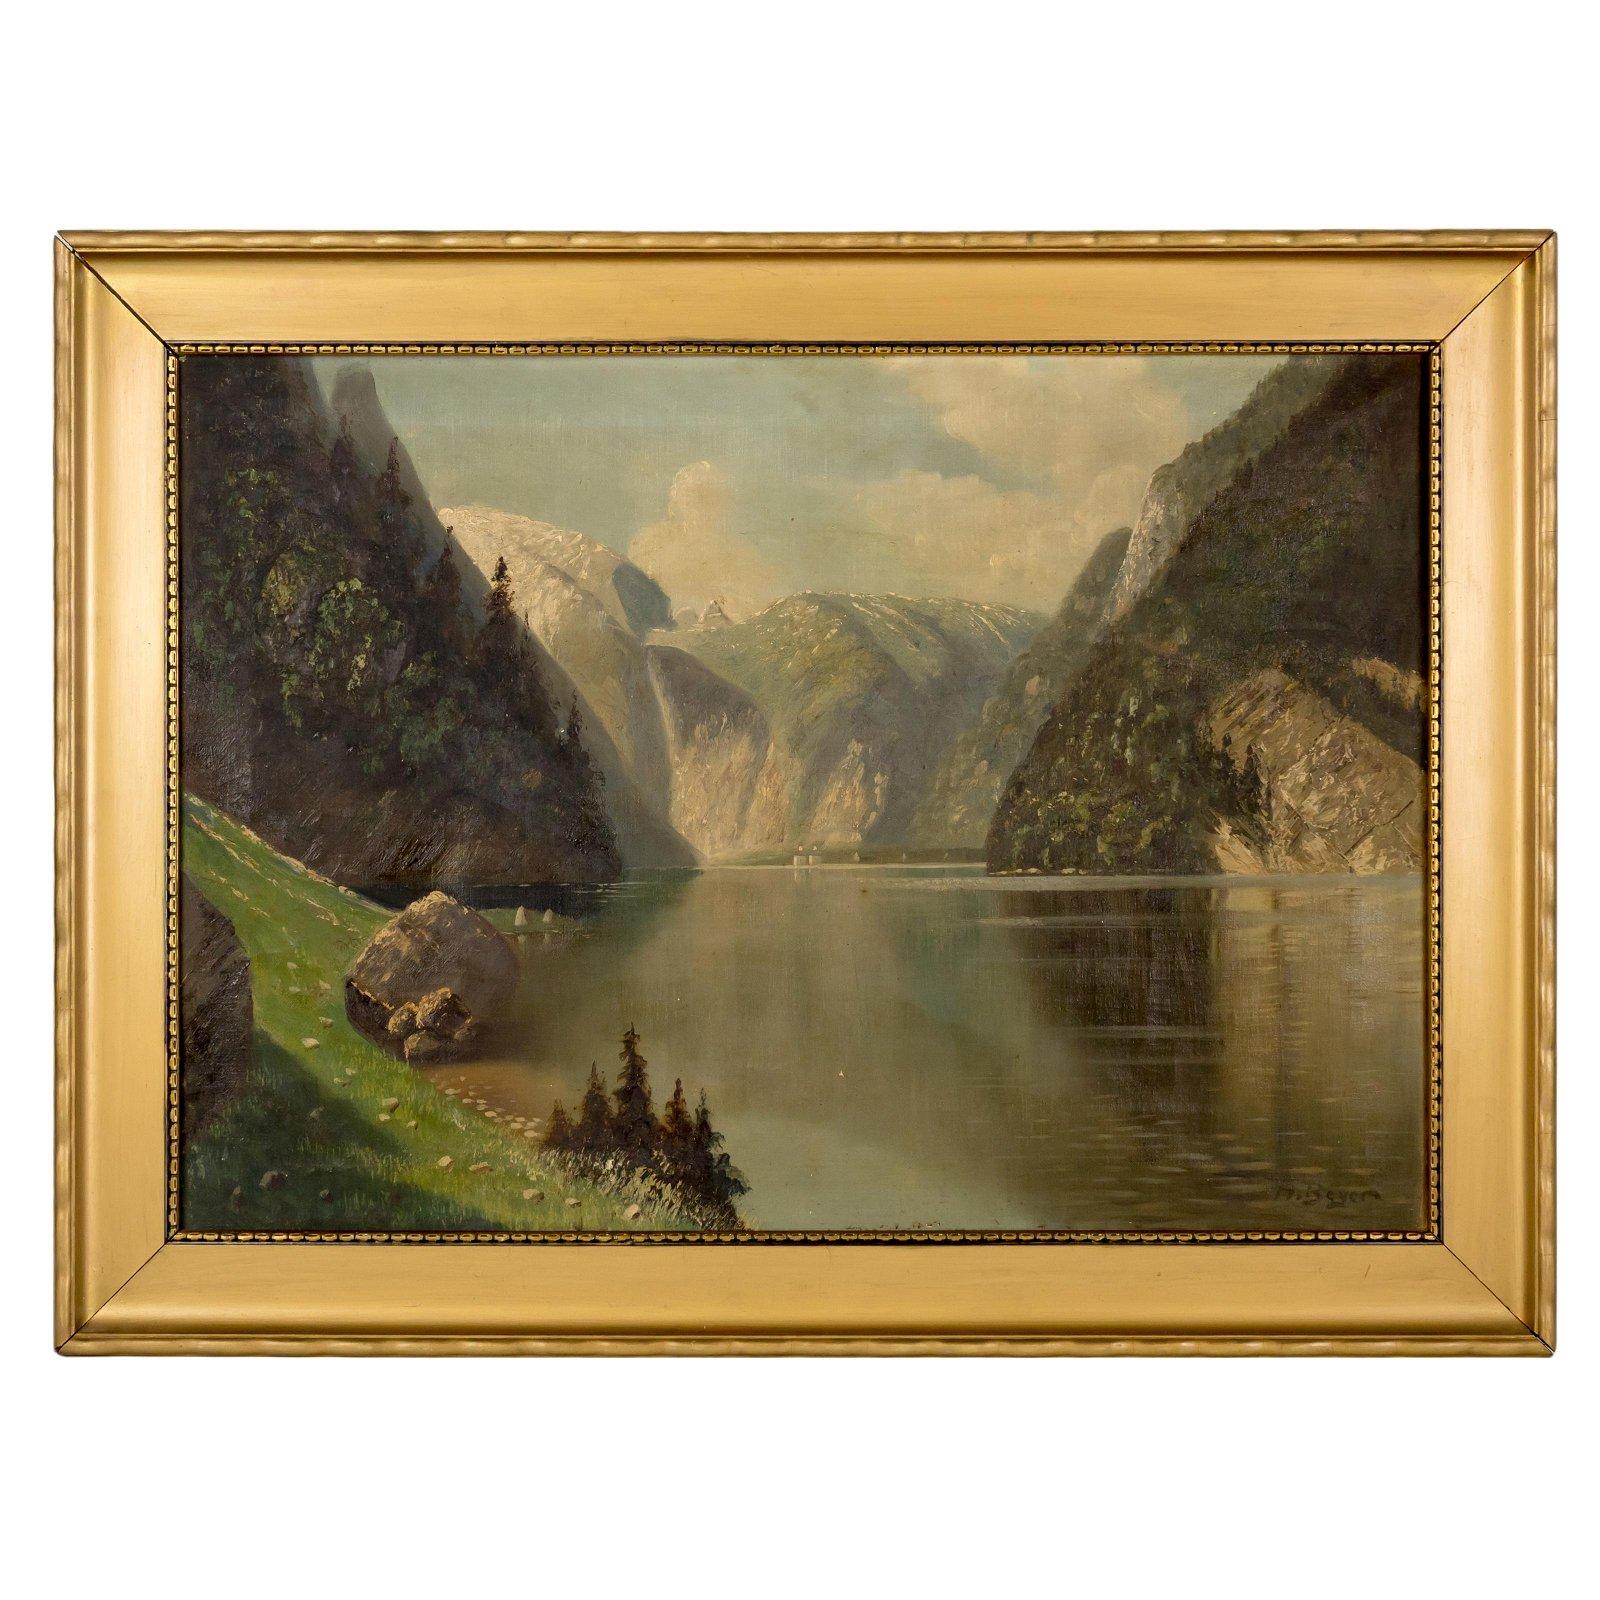 Hans Beyer Signed Landscape Oil Painting on Canvas